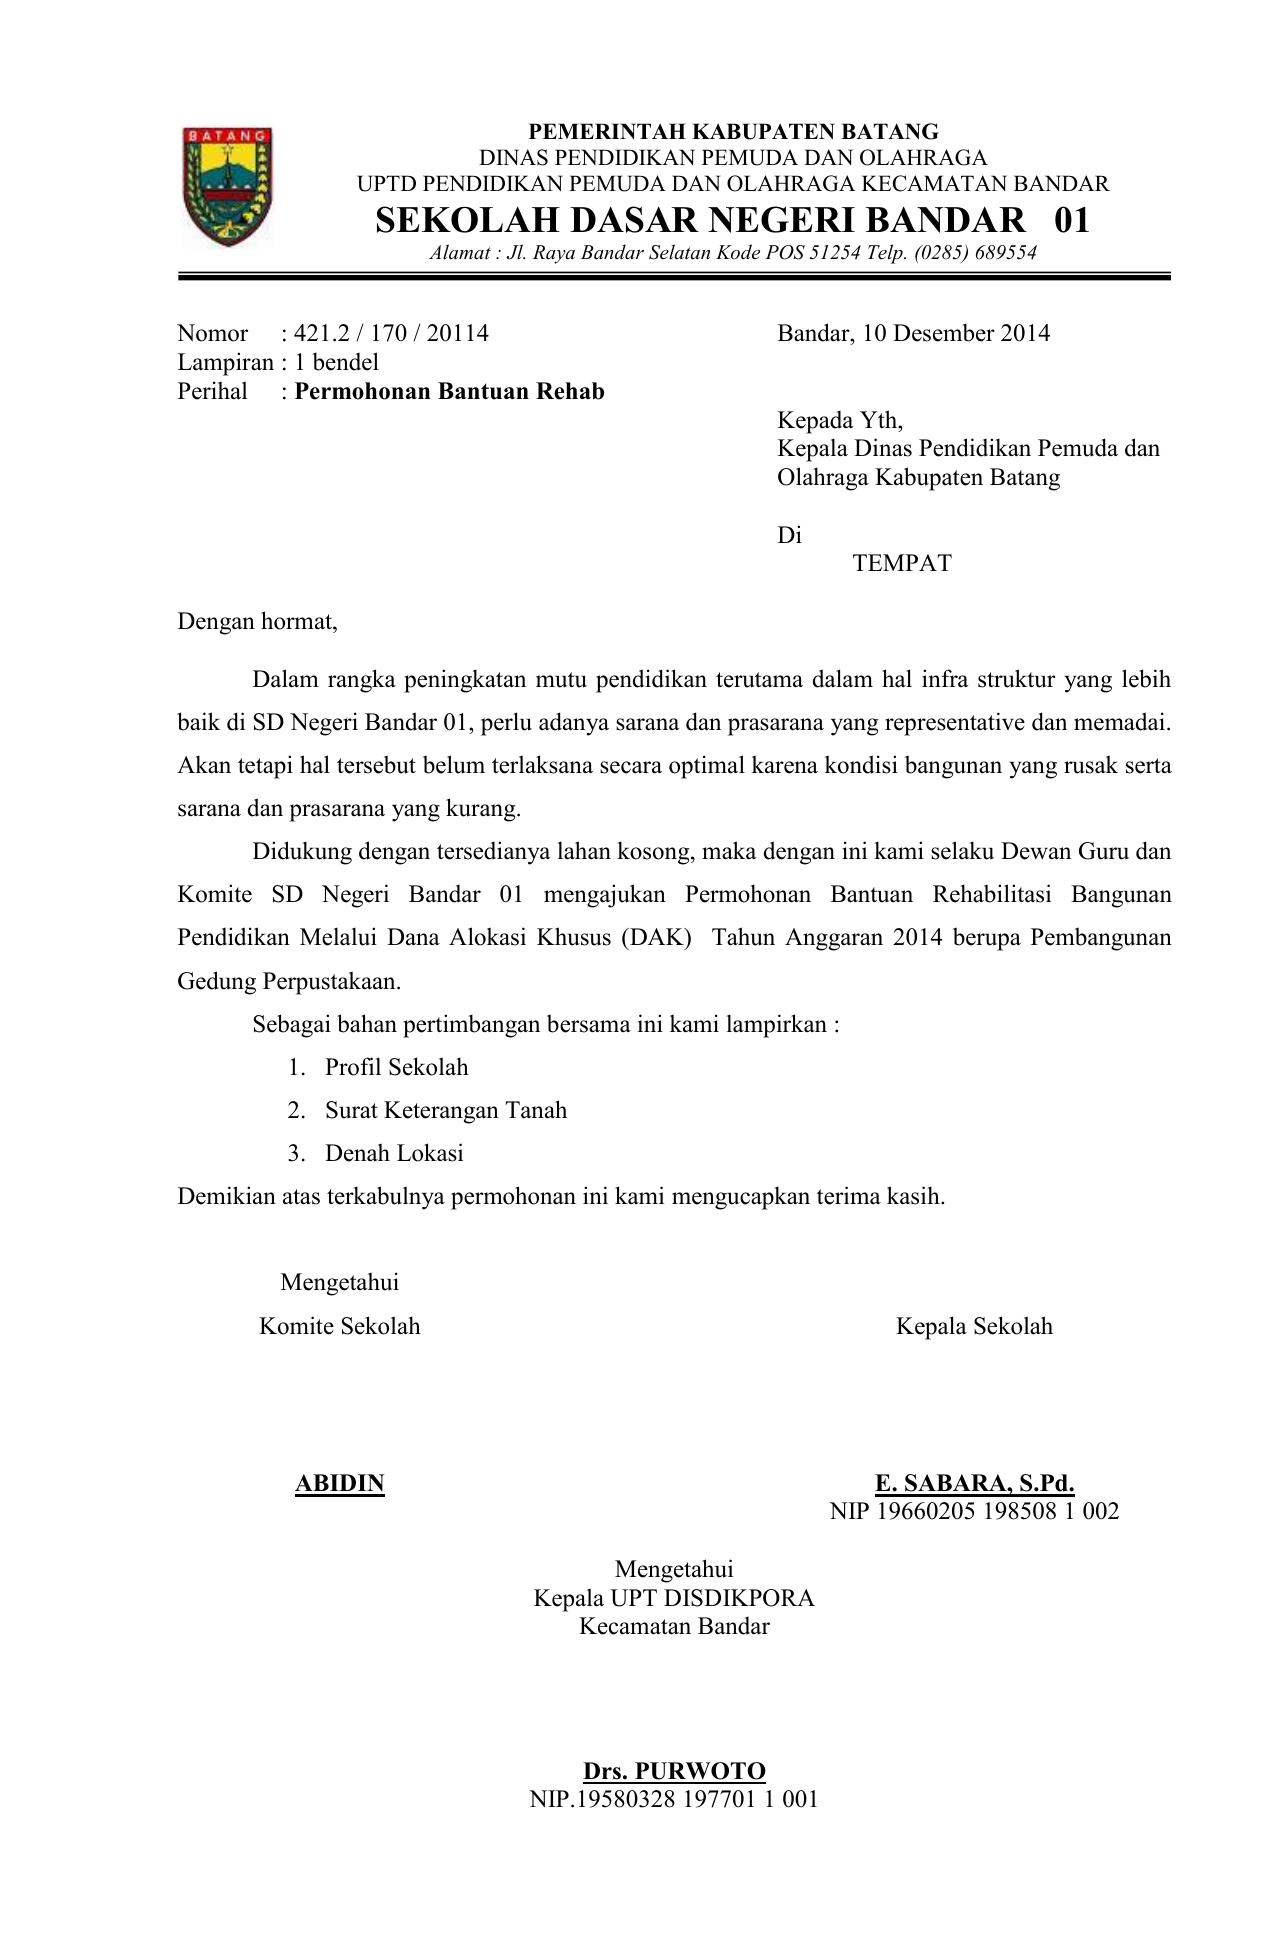 Contoh Proposal Dak Perpustakaan